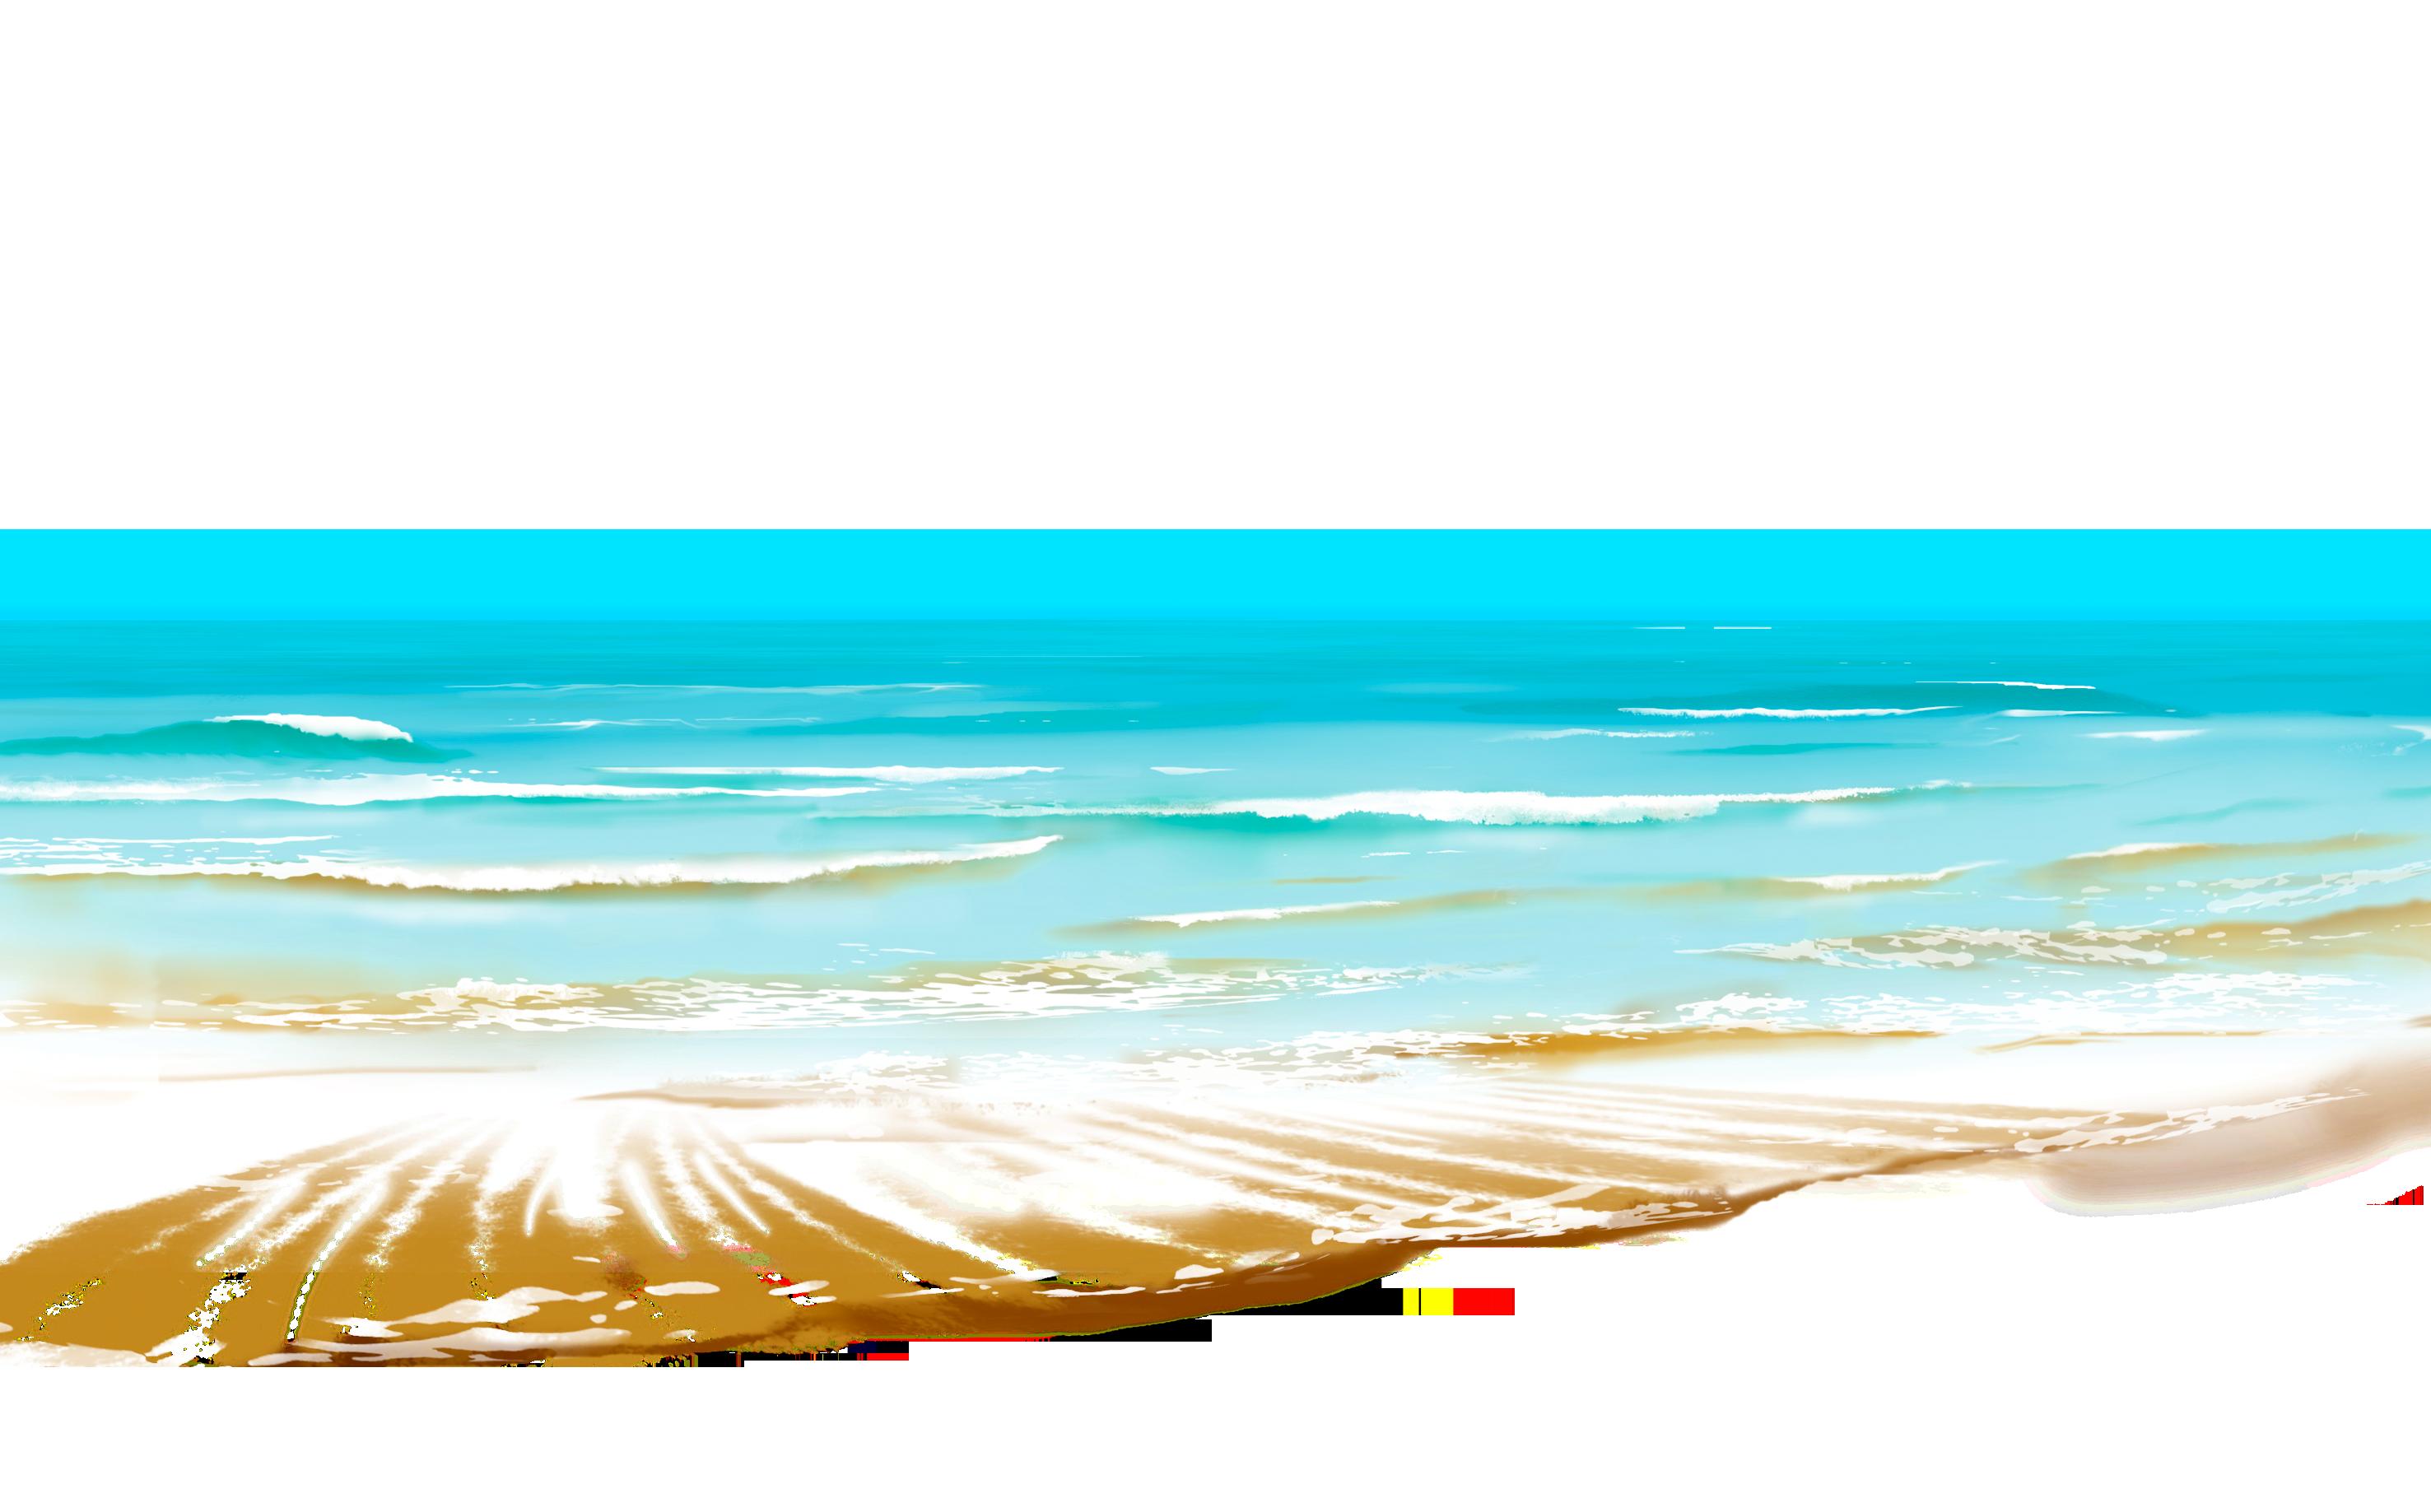 Clipart waves sand. Shore blue wave sea